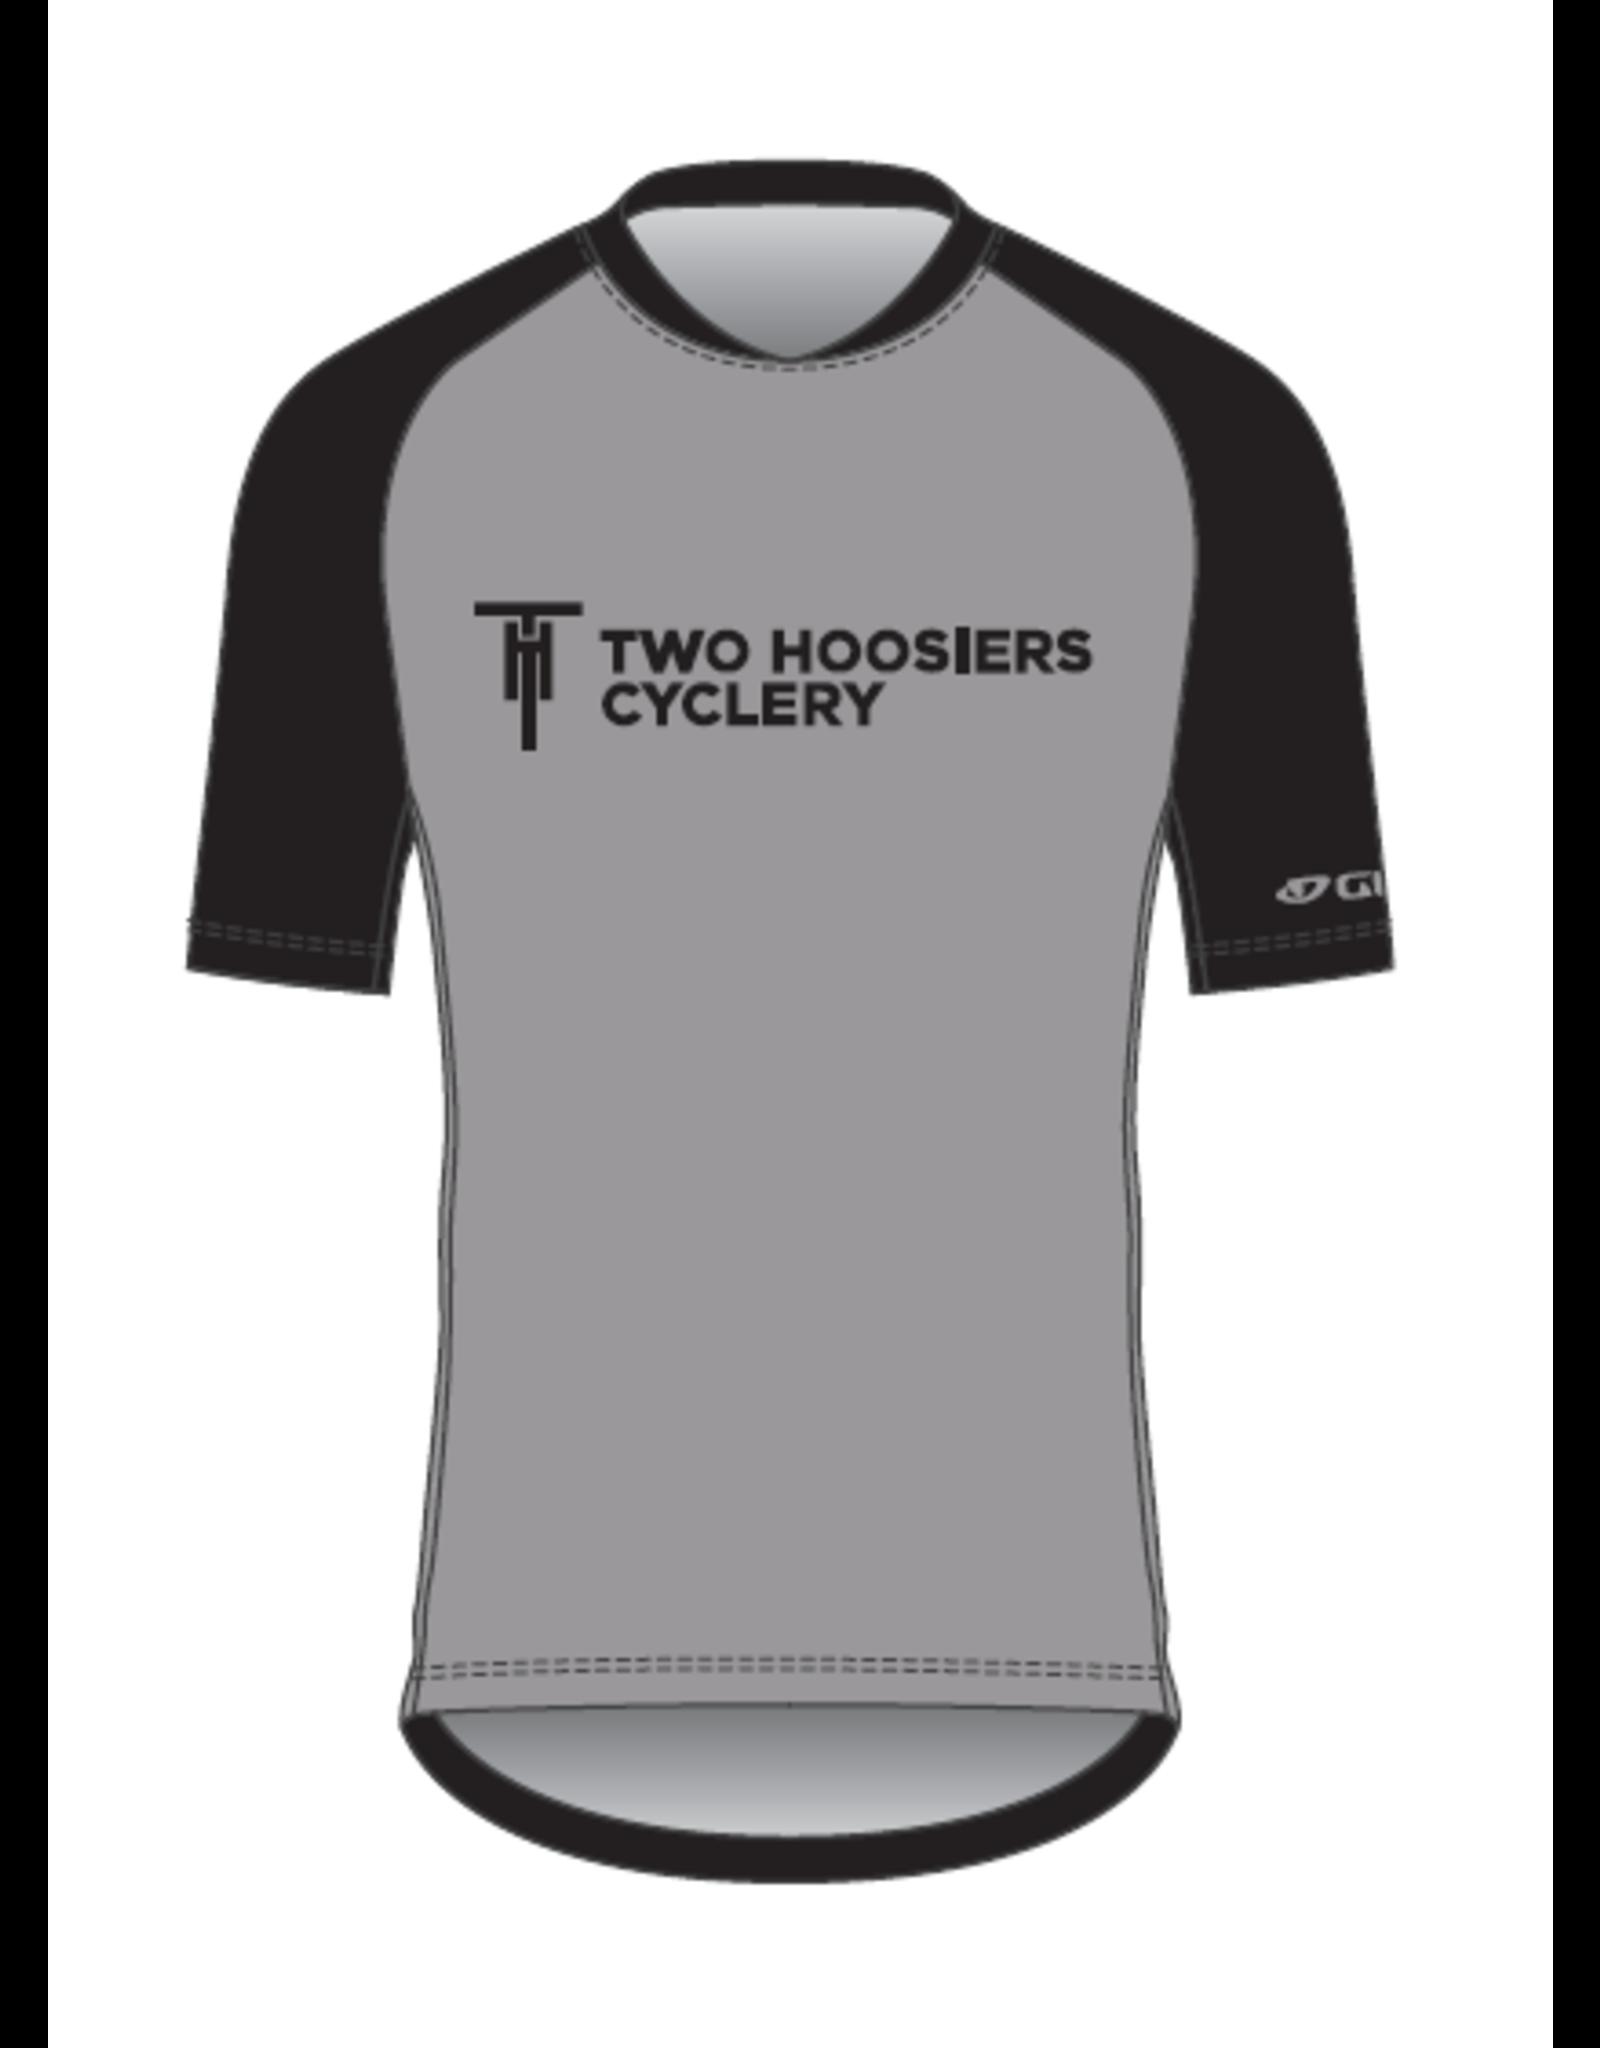 Giro 2021 Two Hoosiers Cyclery Giro Roust Jersey